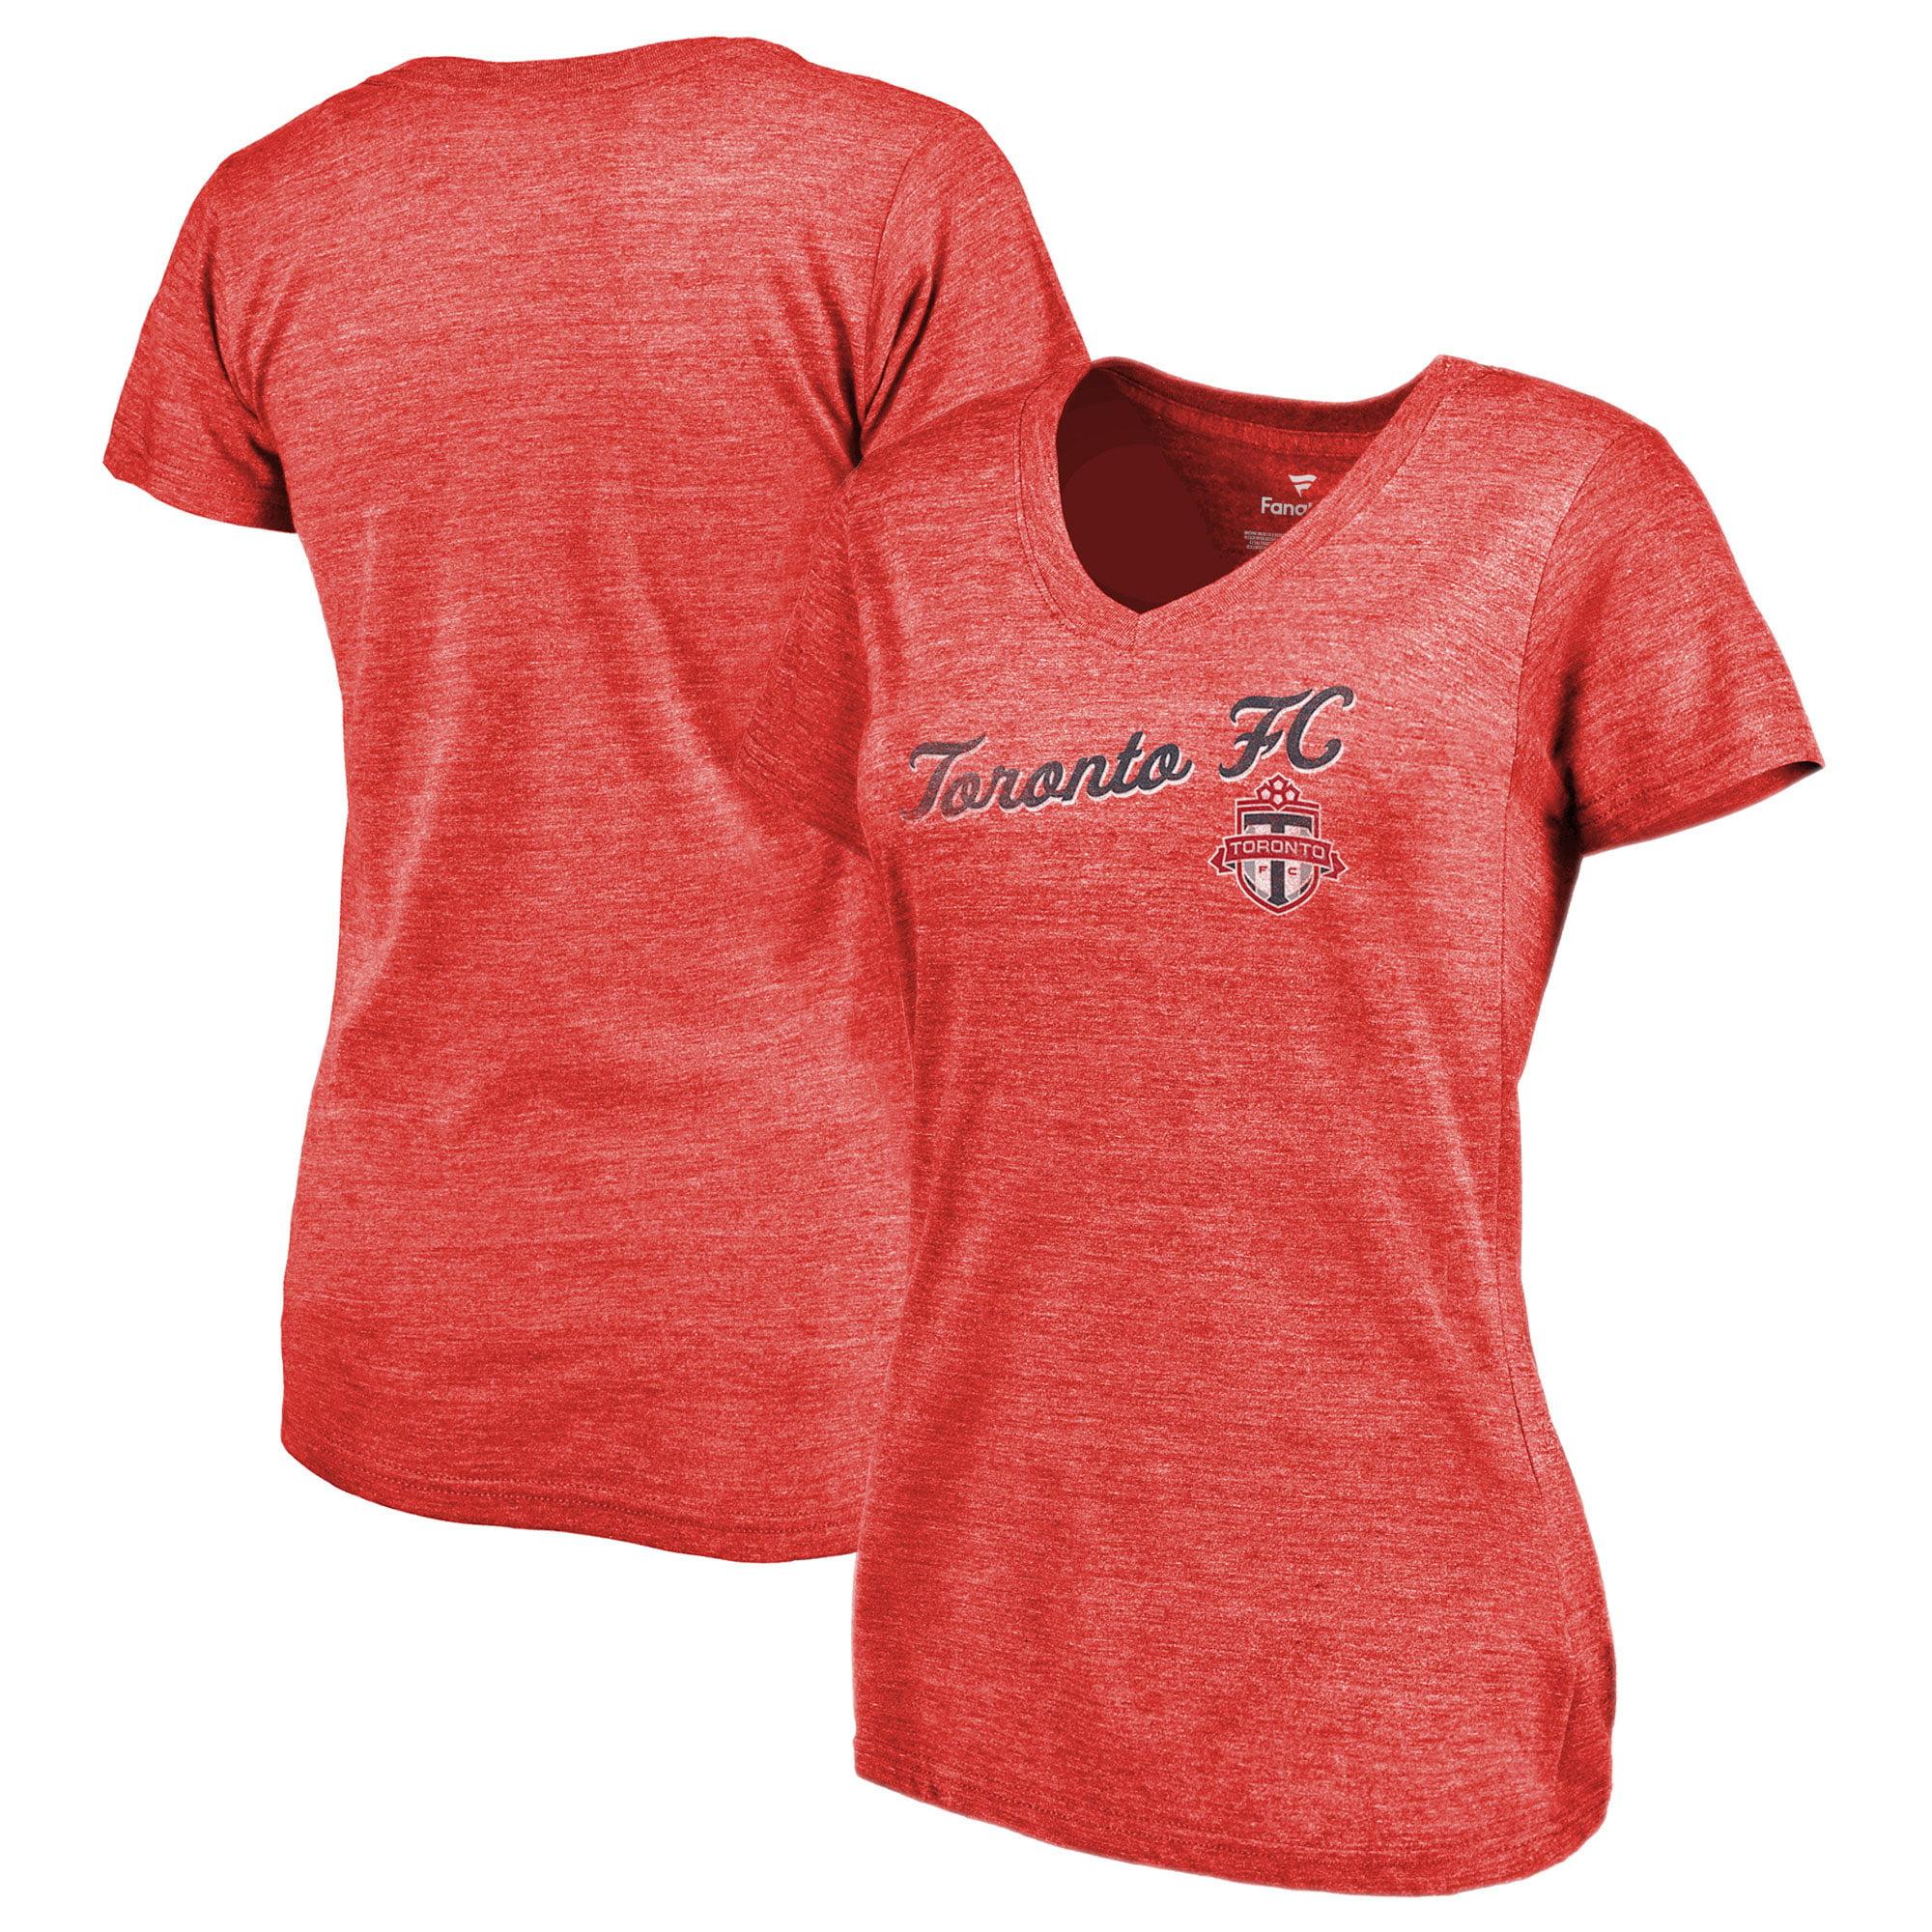 Toronto FC Fanatics Branded Women's Rising Script V-Neck Tri-Blend T-Shirt - Heathered Red